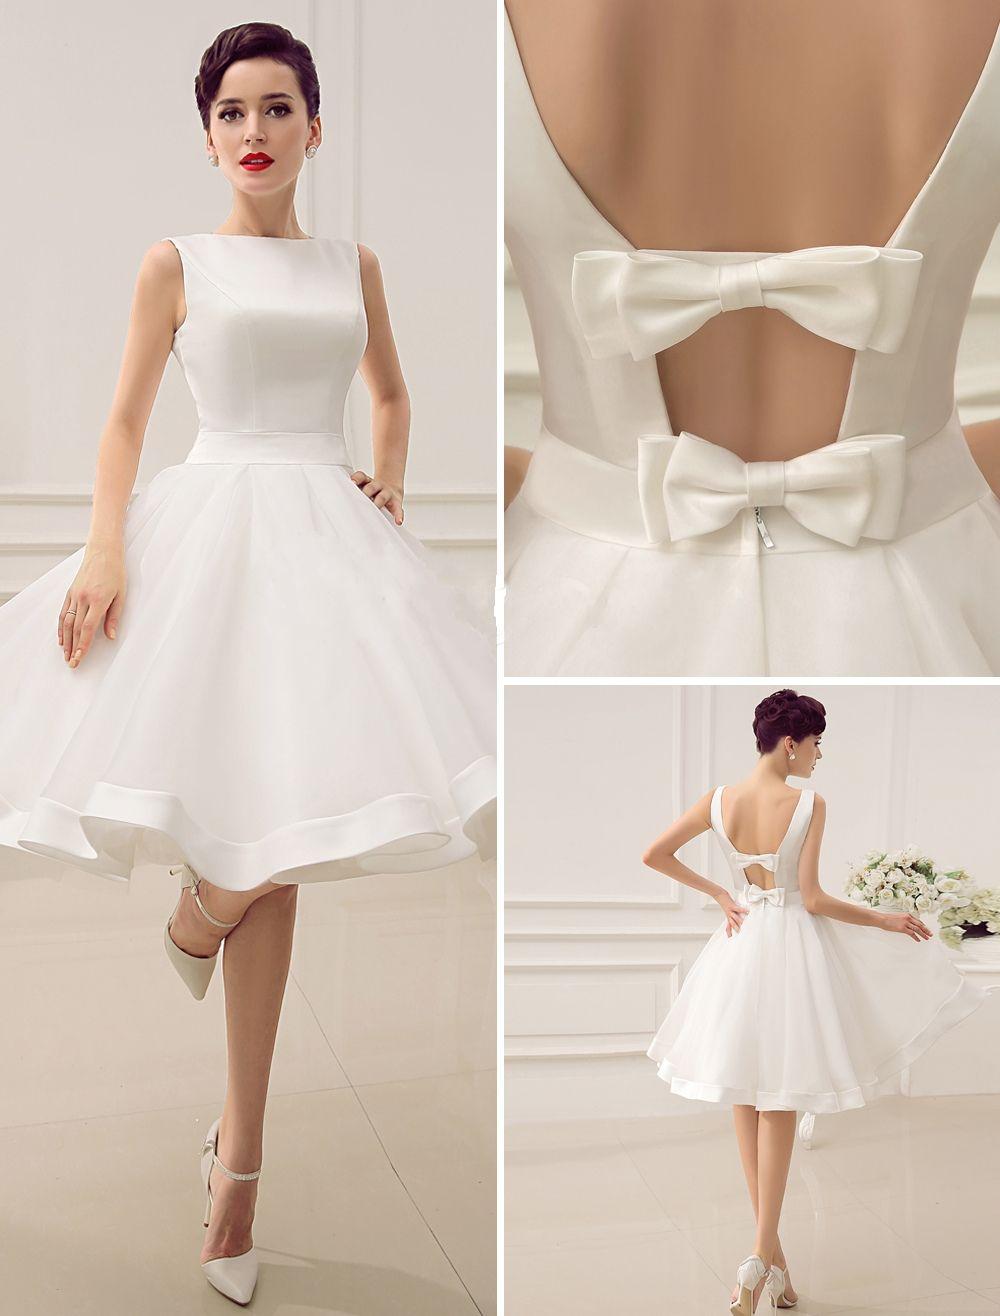 New modern wedding dresses vintage bridesmaid dresses short vintage bridesmaid dresses short ombrellifo Choice Image